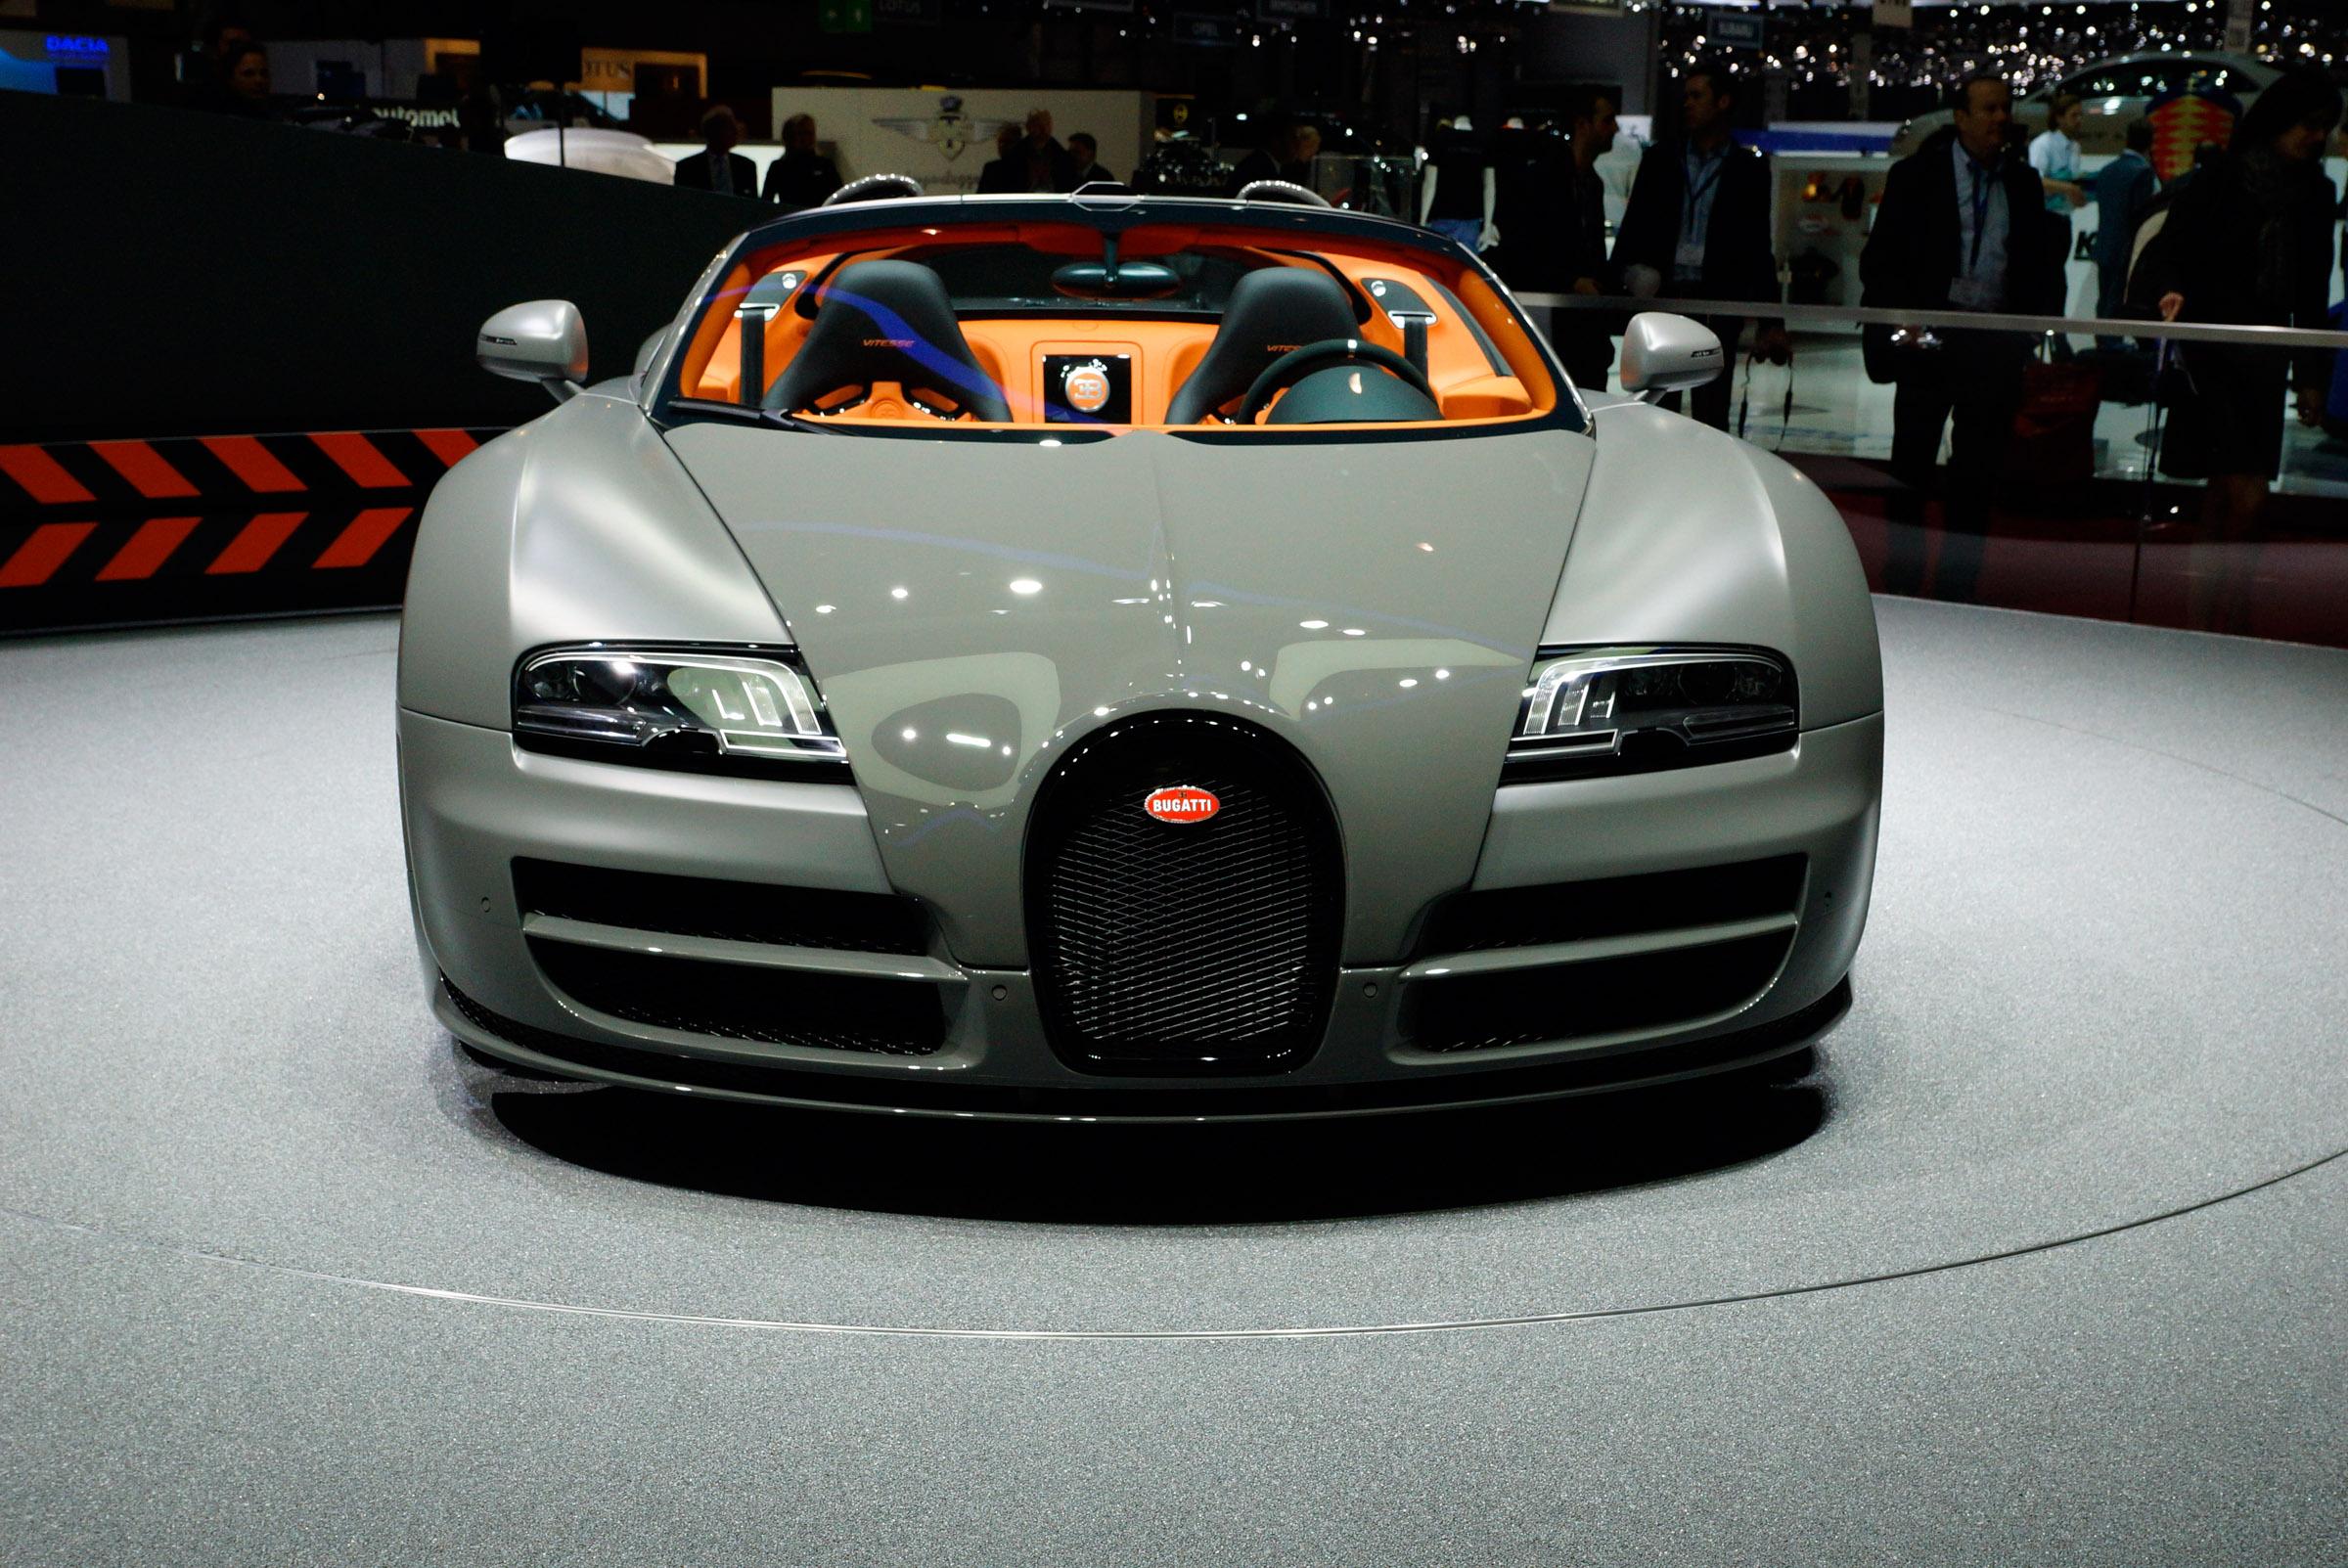 bugatti-veyron-16-4-grand-sport-vitesse-geneva-2012-04 Fabulous 2012 Bugatti Veyron Grand Sport Vitesse Specs Cars Trend